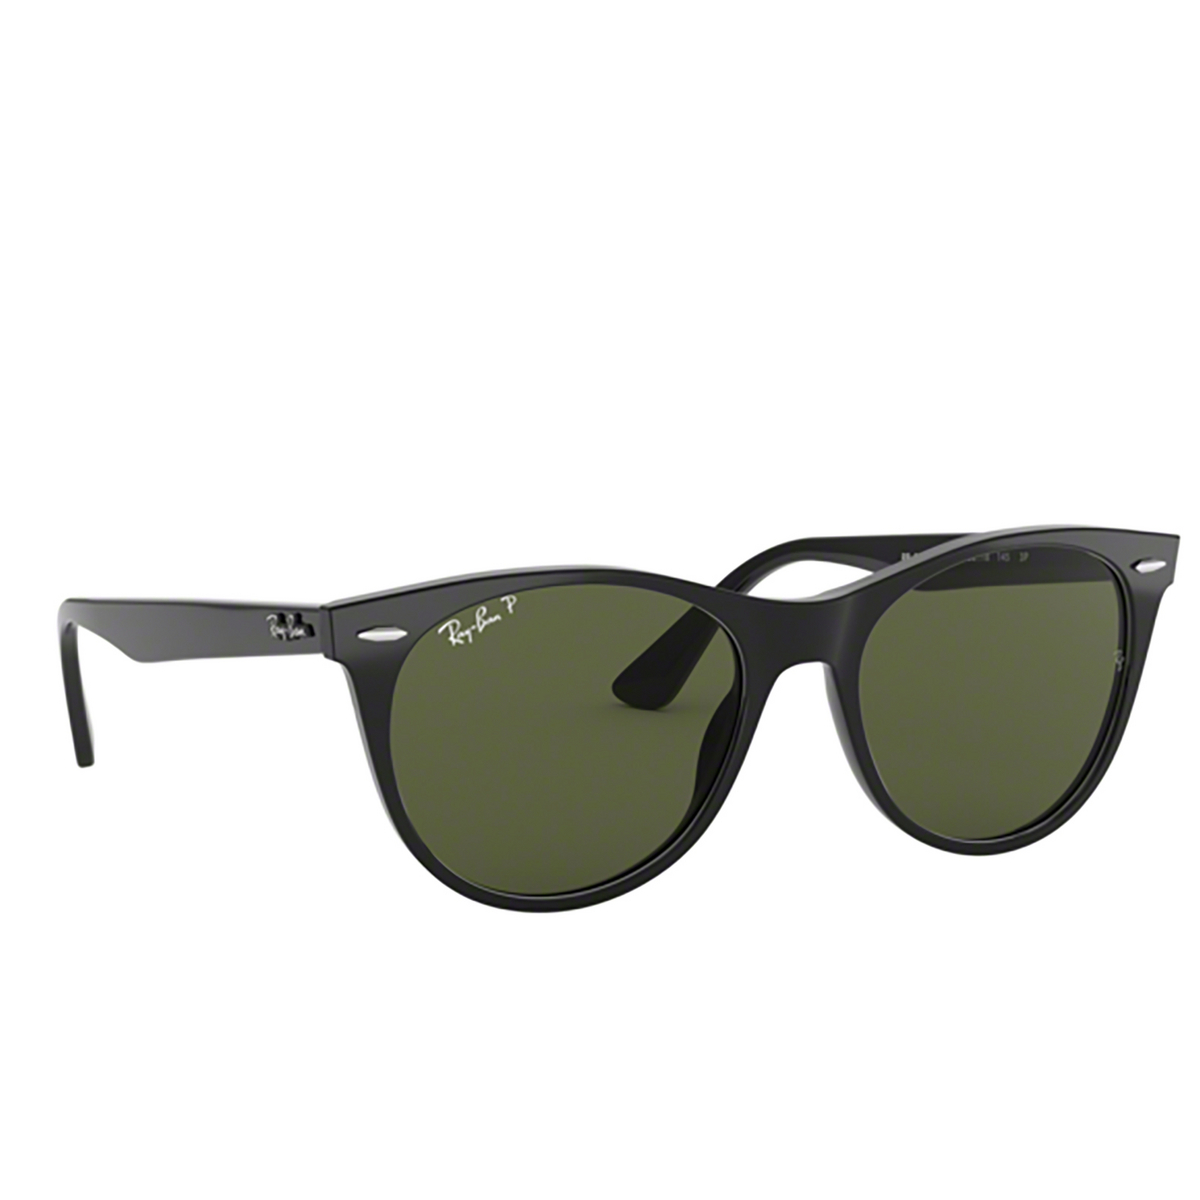 Ray-Ban® Square Sunglasses: Wayfarer Ii RB2185 color Black 901/58 - three-quarters view.